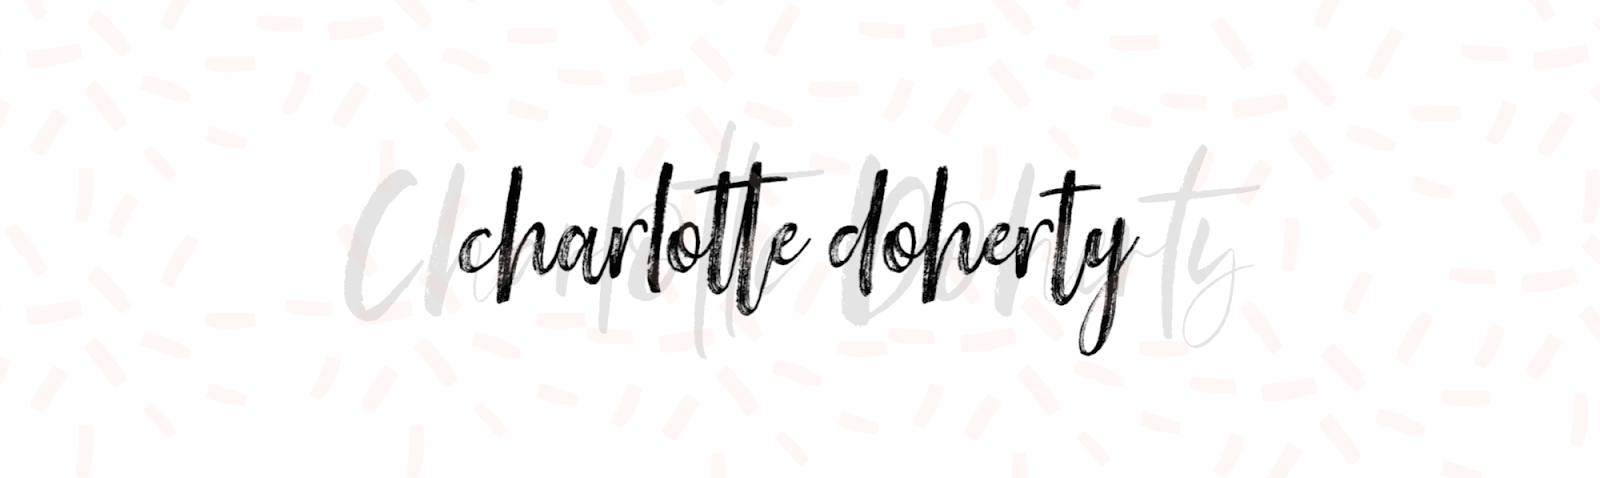 CHARLOTTE DOHERTY